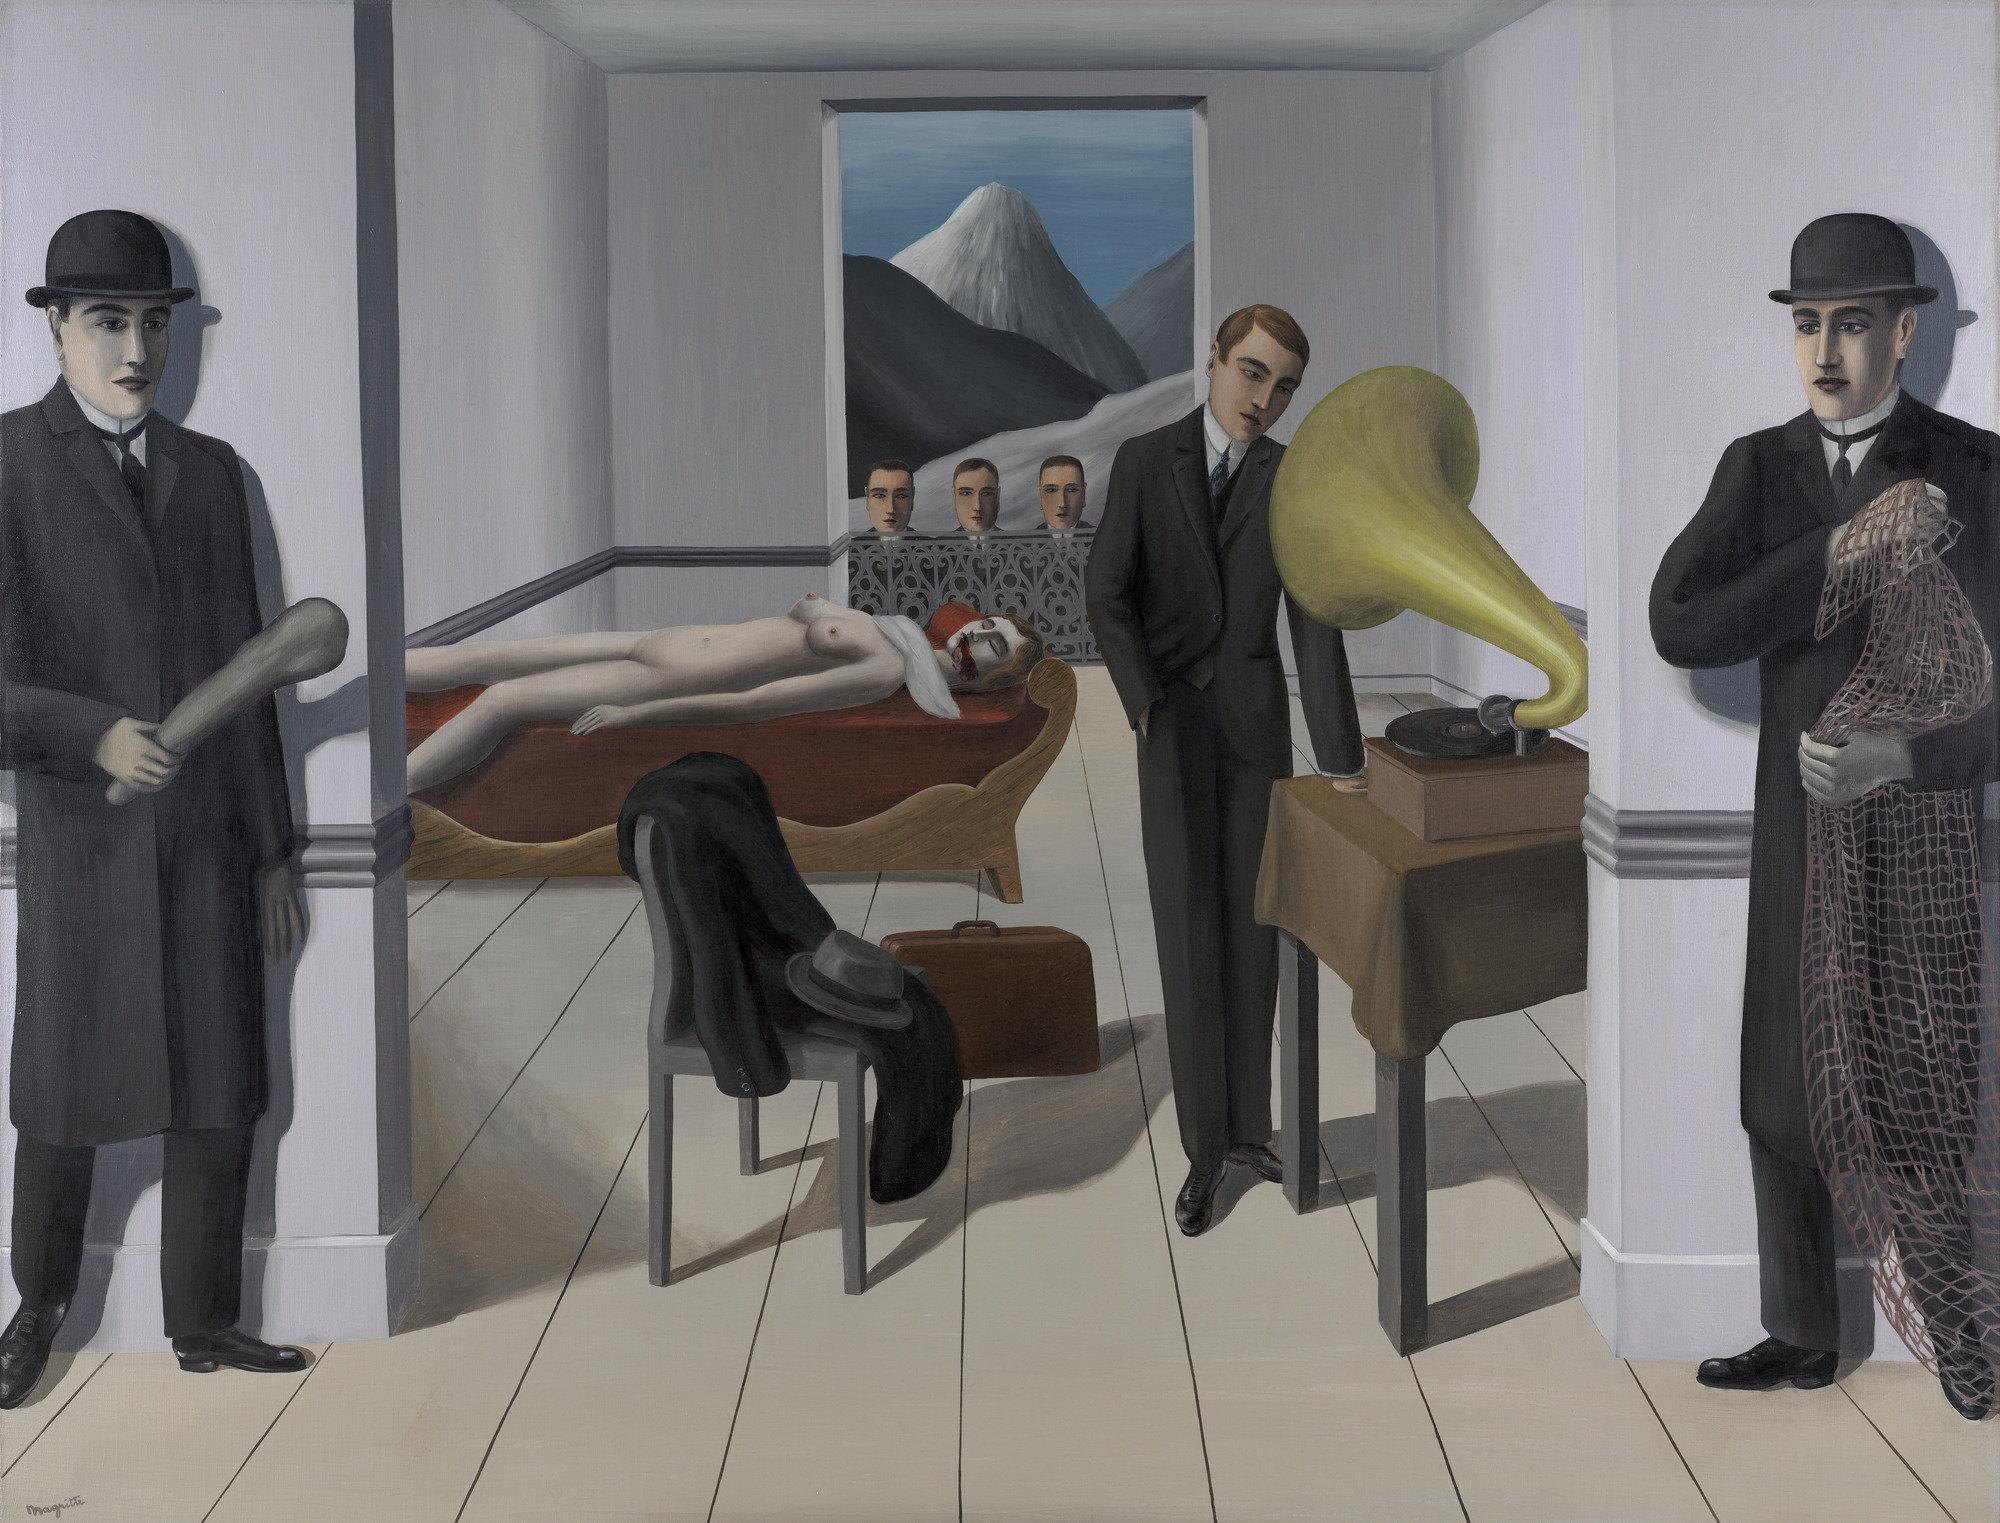 TheMenacedAssasin_Magritte.jpg